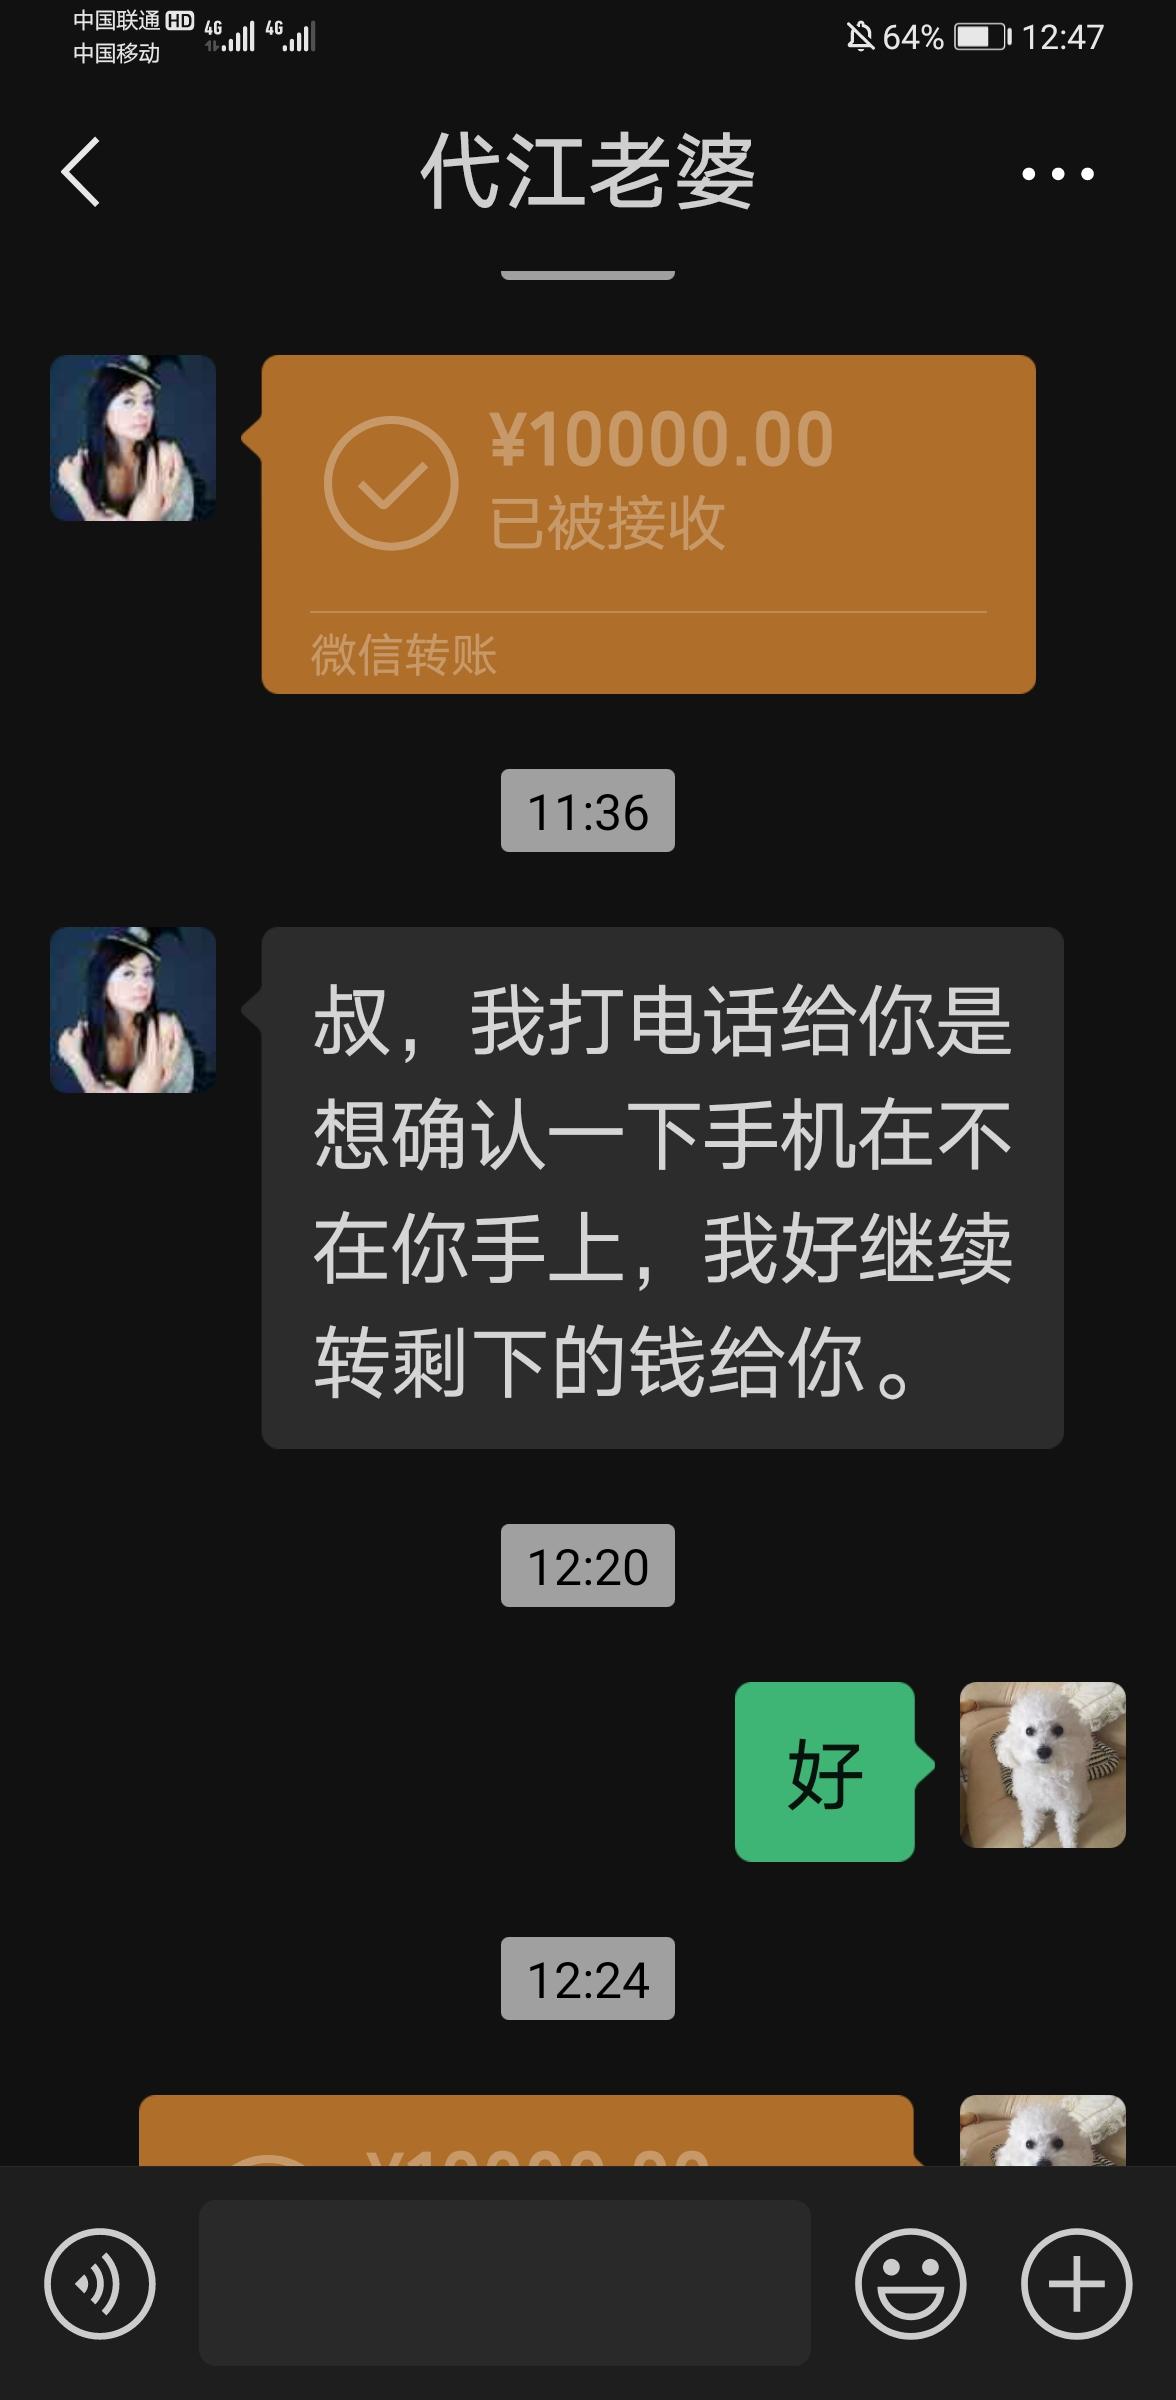 Screenshot_20210531_124728_com.tencent.mm.jpg